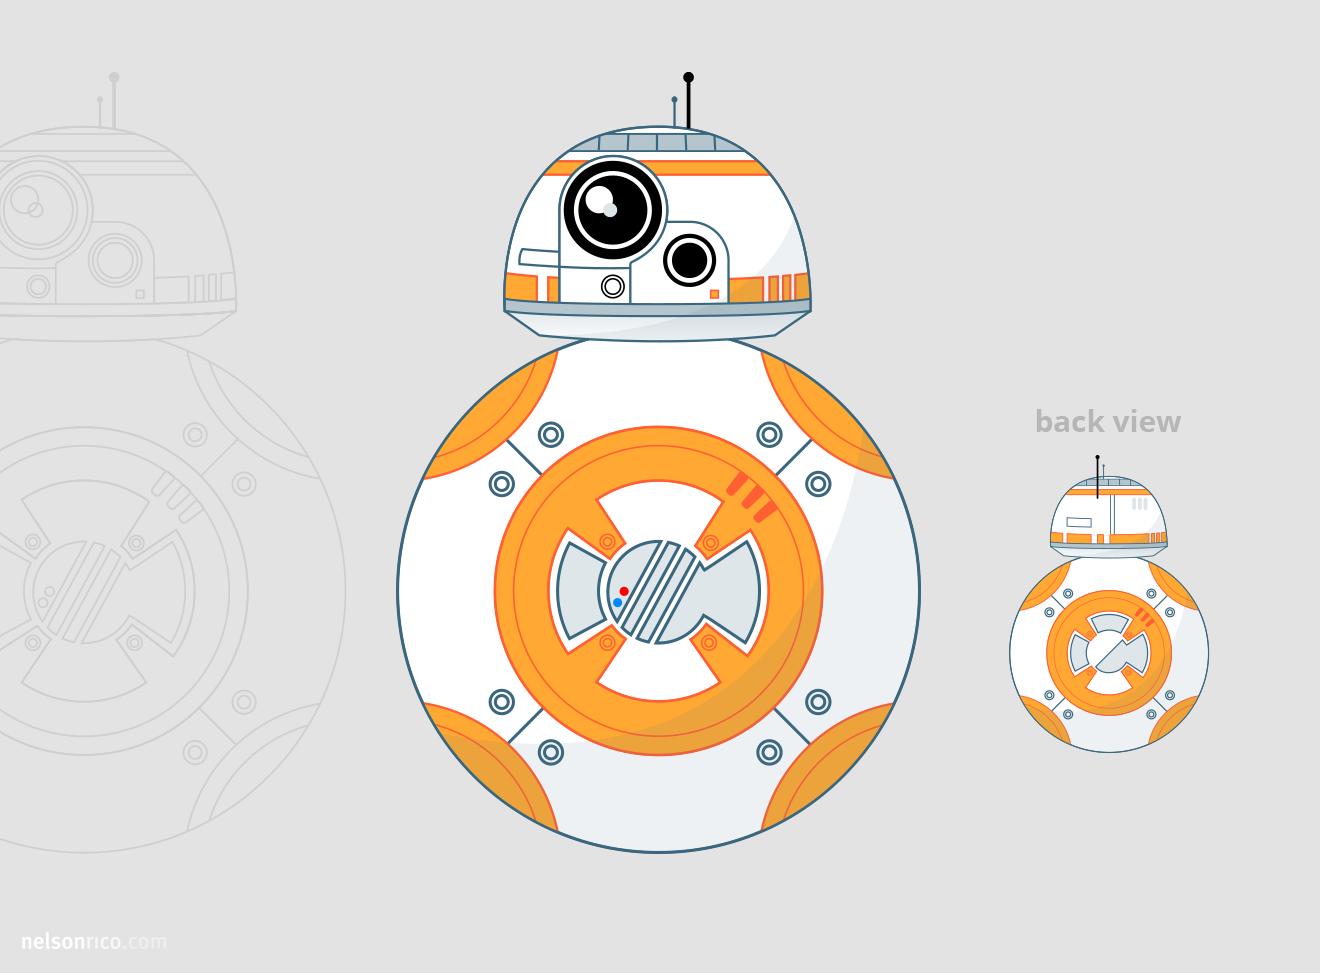 bb8 design - Google Search   Star Wars Cakes   Pinterest   Backen ...